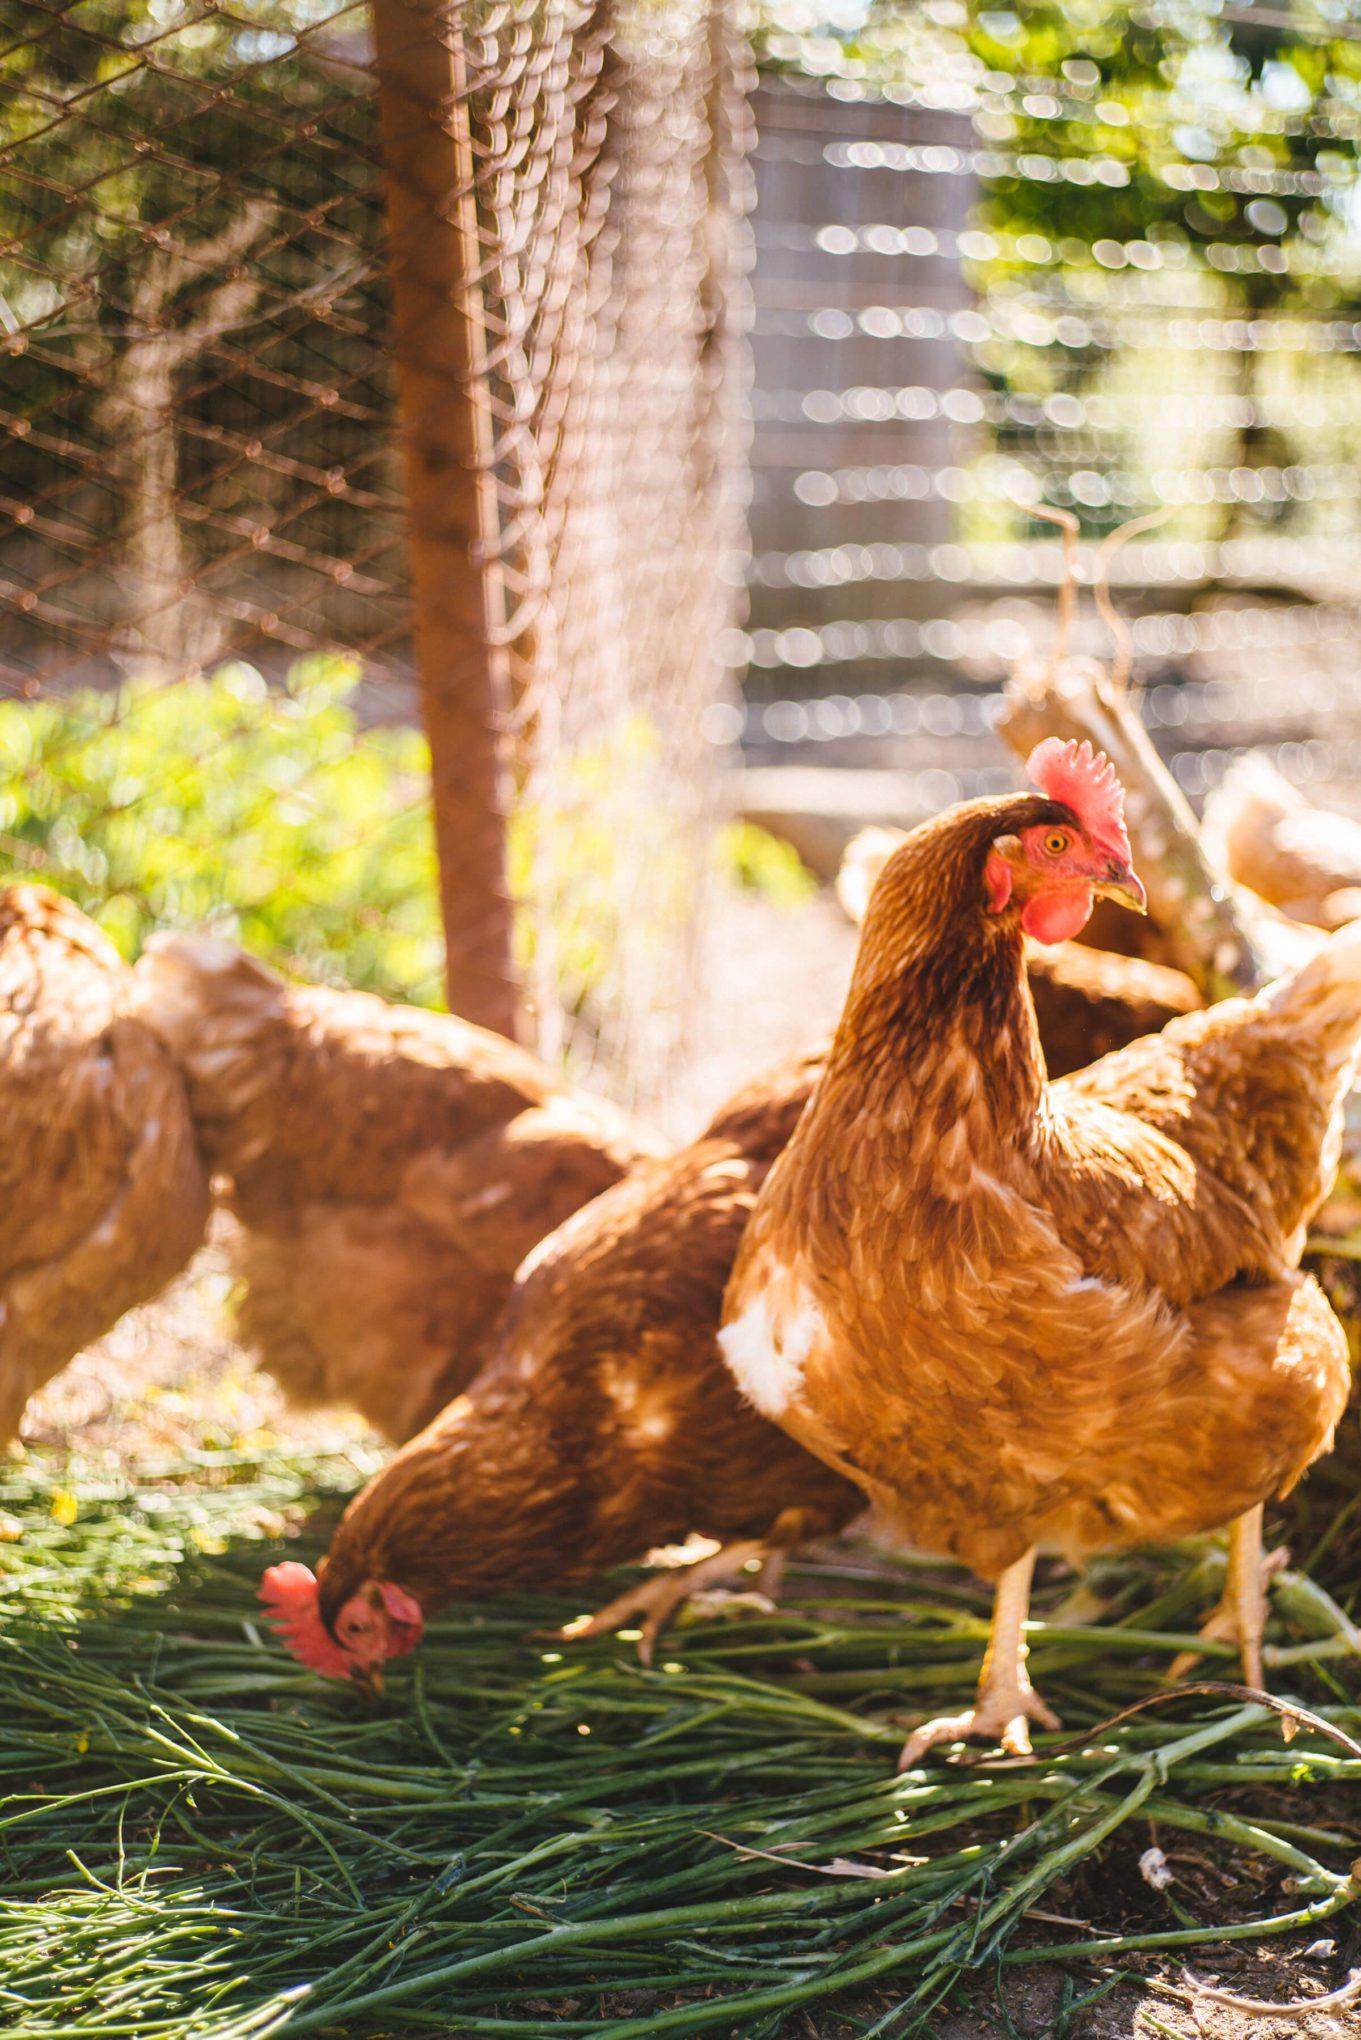 chickens at da gelsomina restaurant in capri, italy, the taste edit